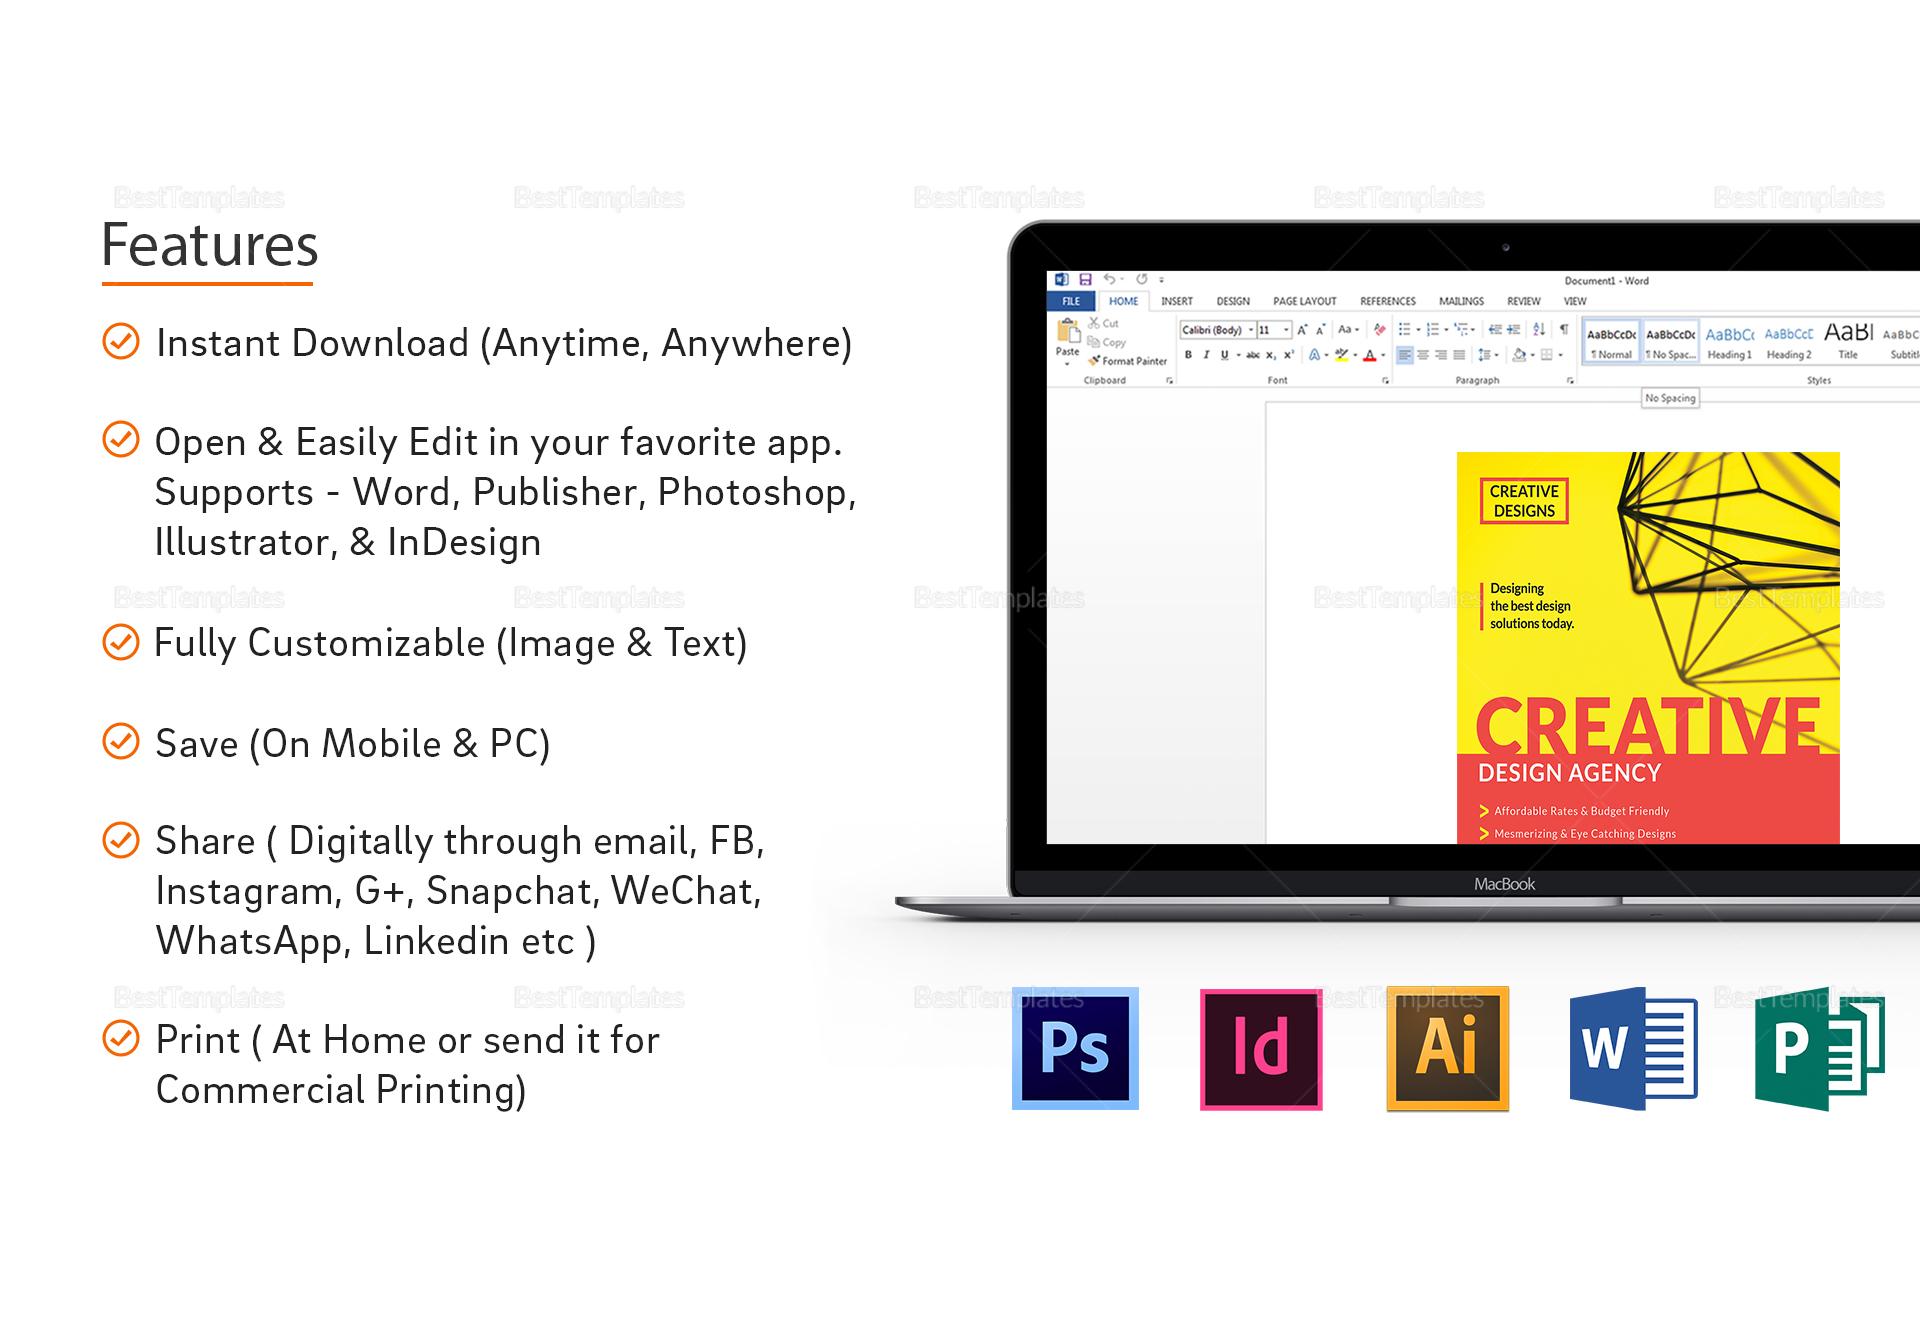 Creative Design Agency Flyer